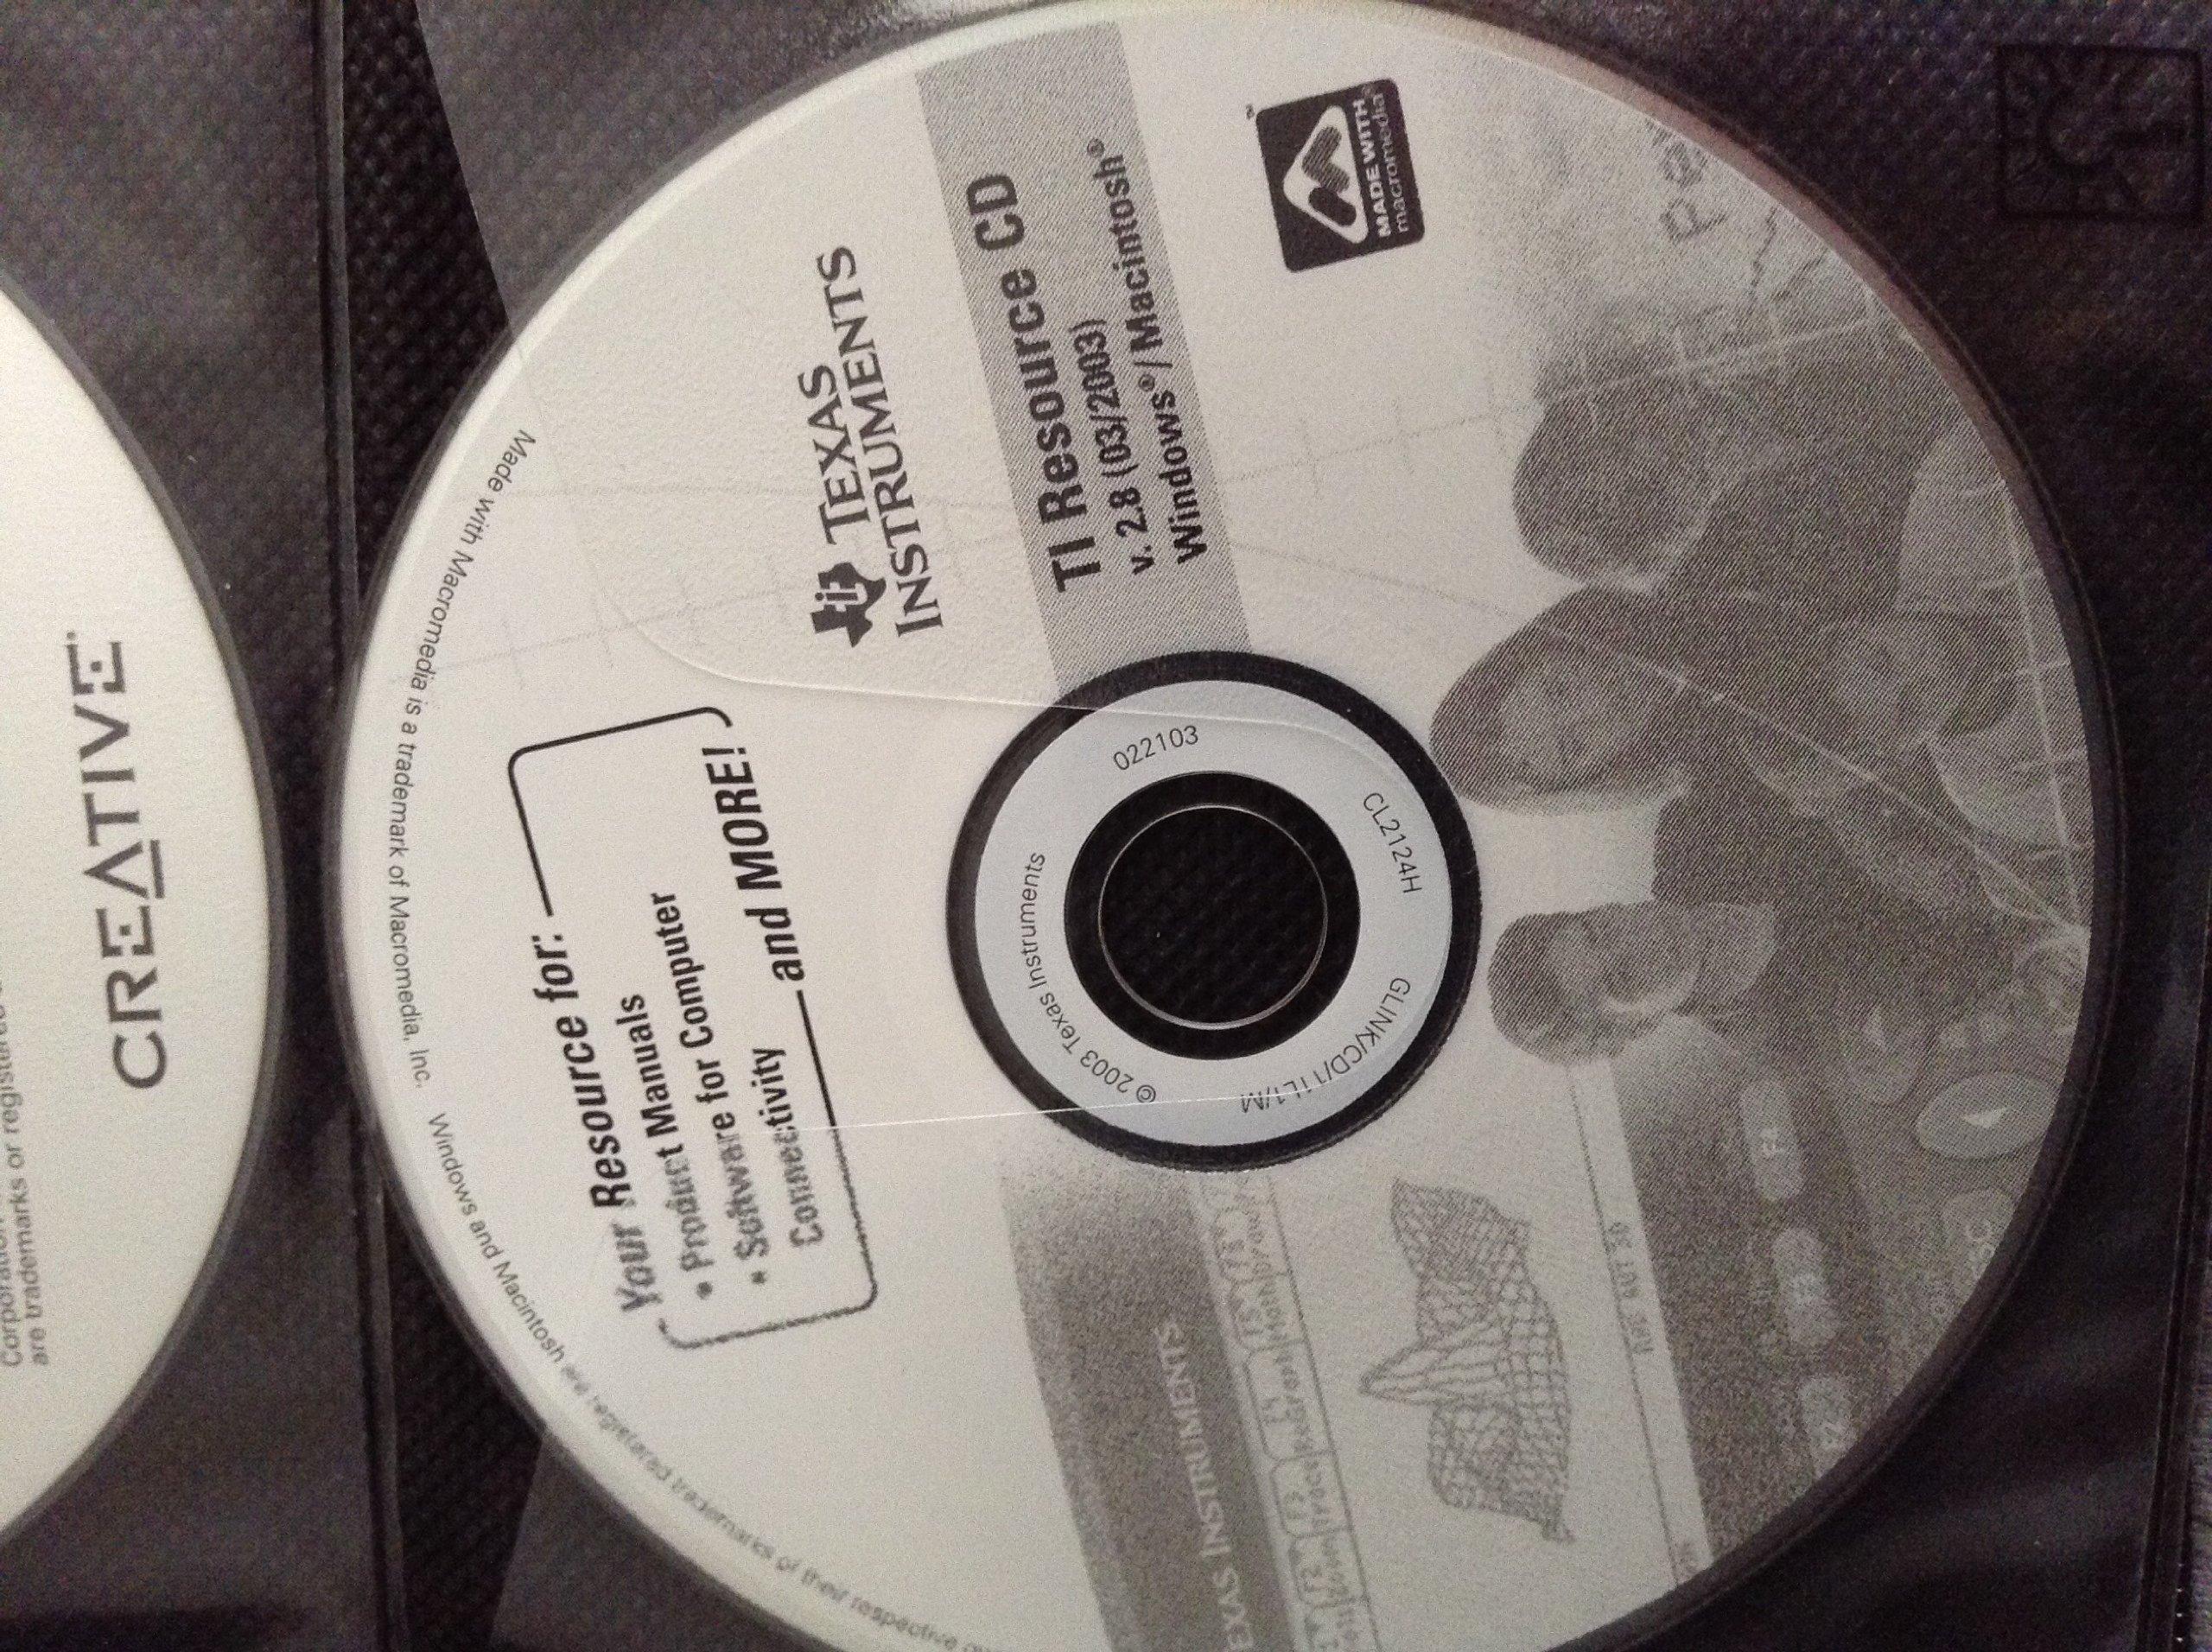 Texas Instruments Ti Resource Cd (windows/macintosh, v.2.7.1